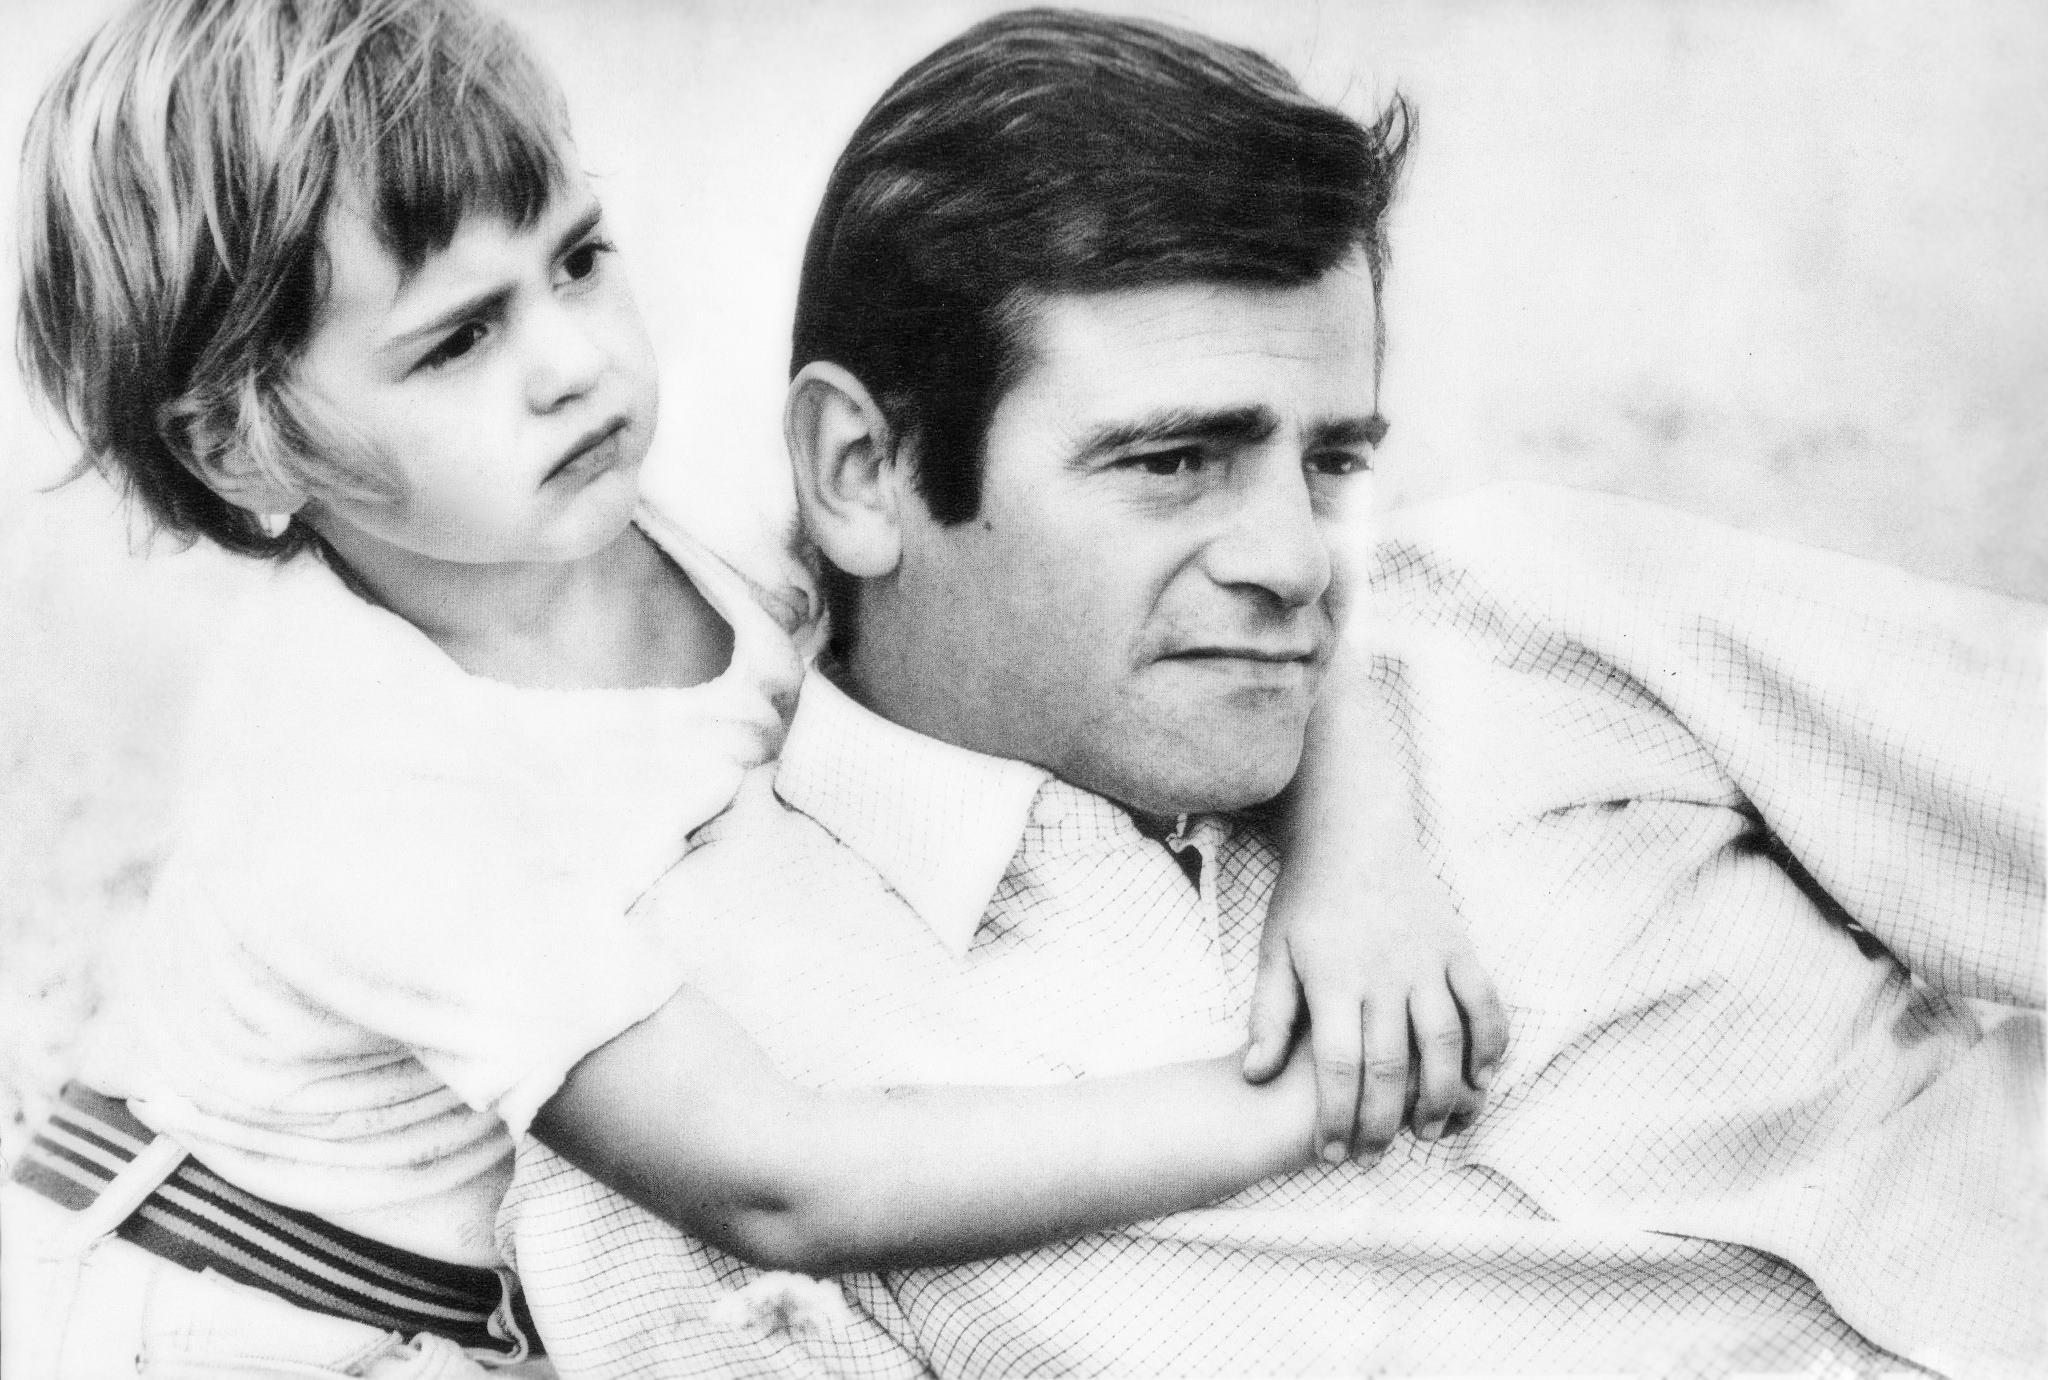 «Sergio Endrigo, mio padre – Artista per caso» Intervista a Claudia Endrigo